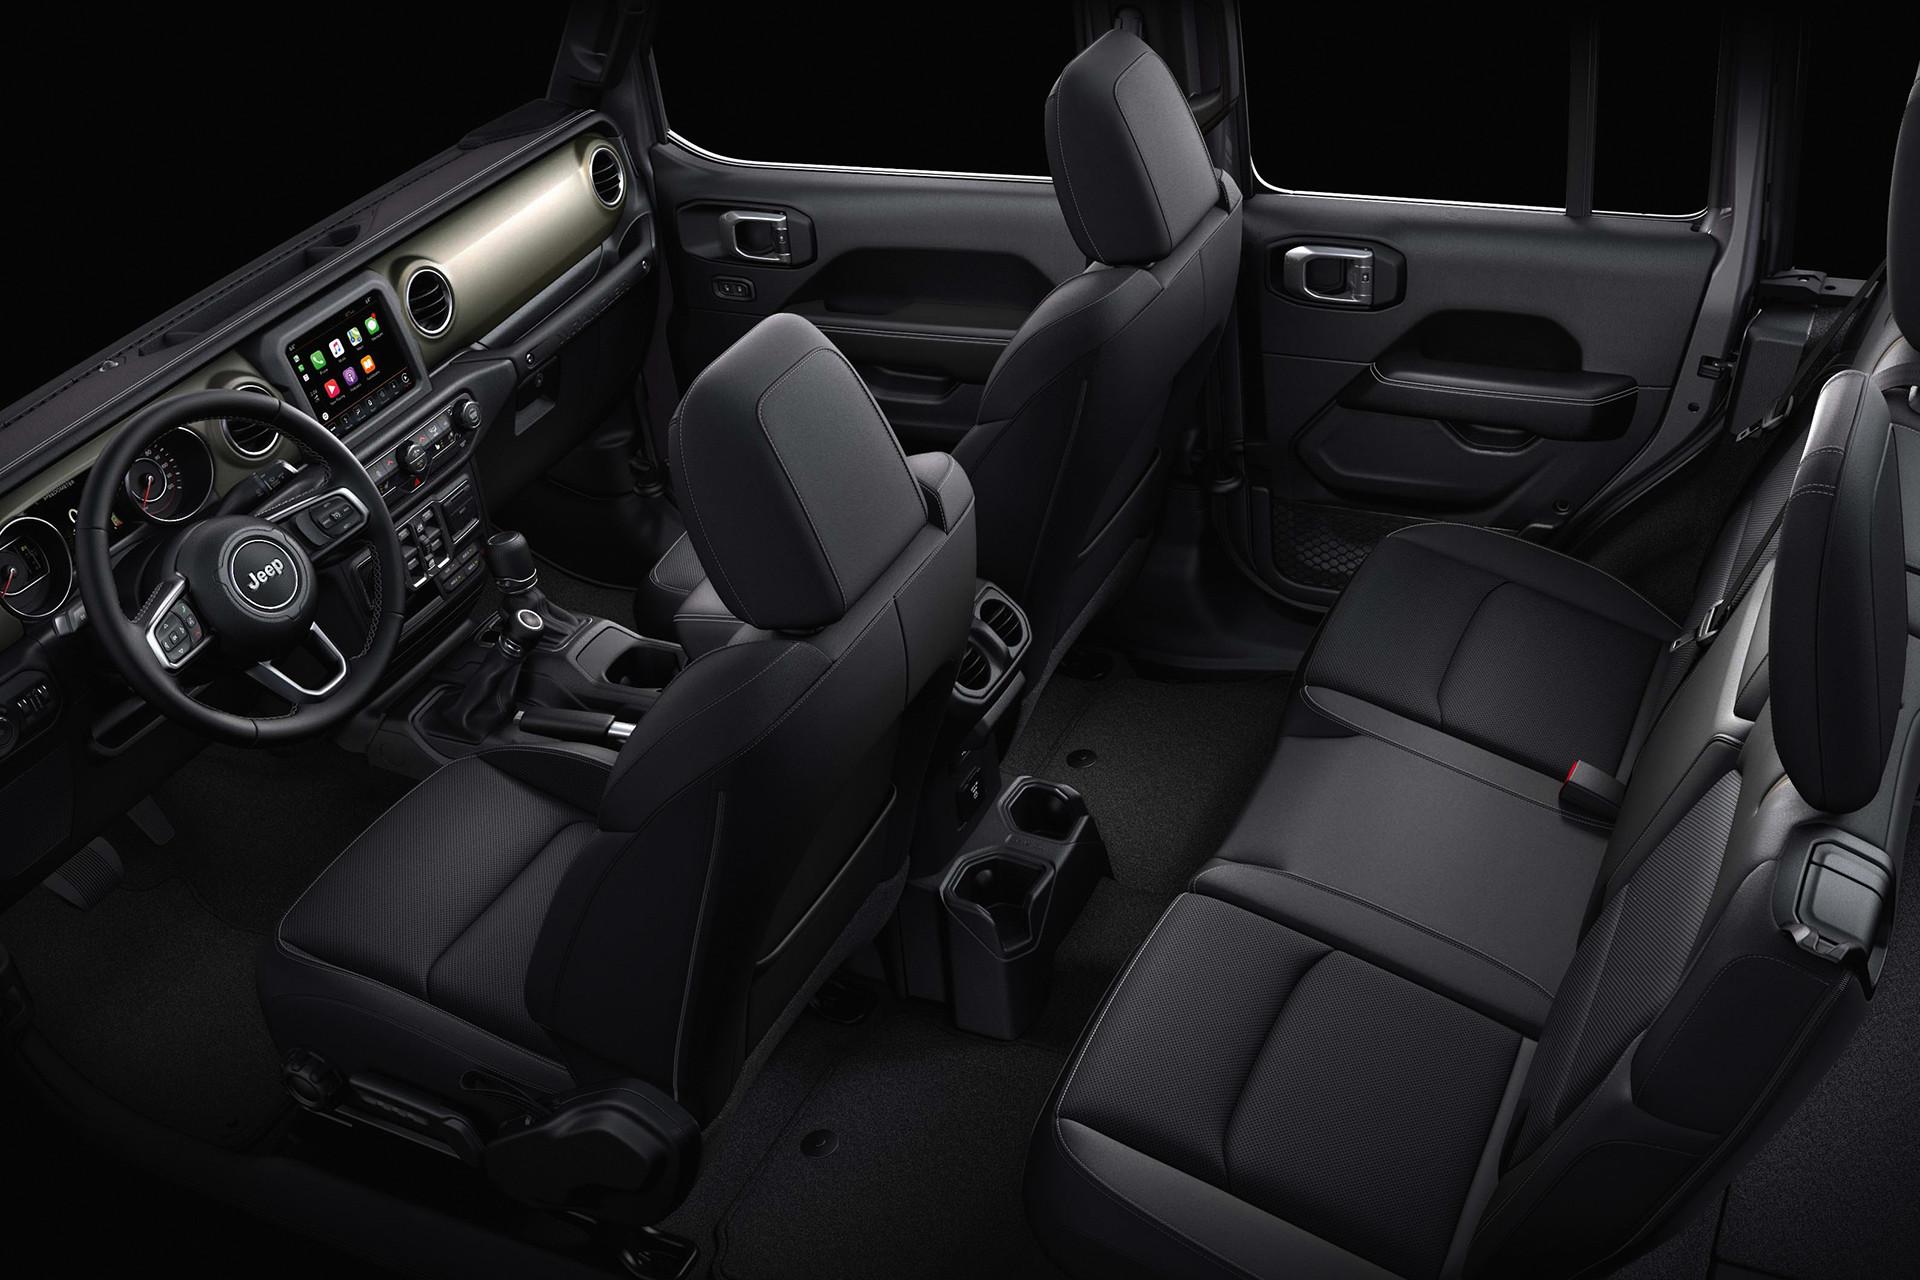 2019 Jeep Wrangler Interior Gallery Jeep Canada